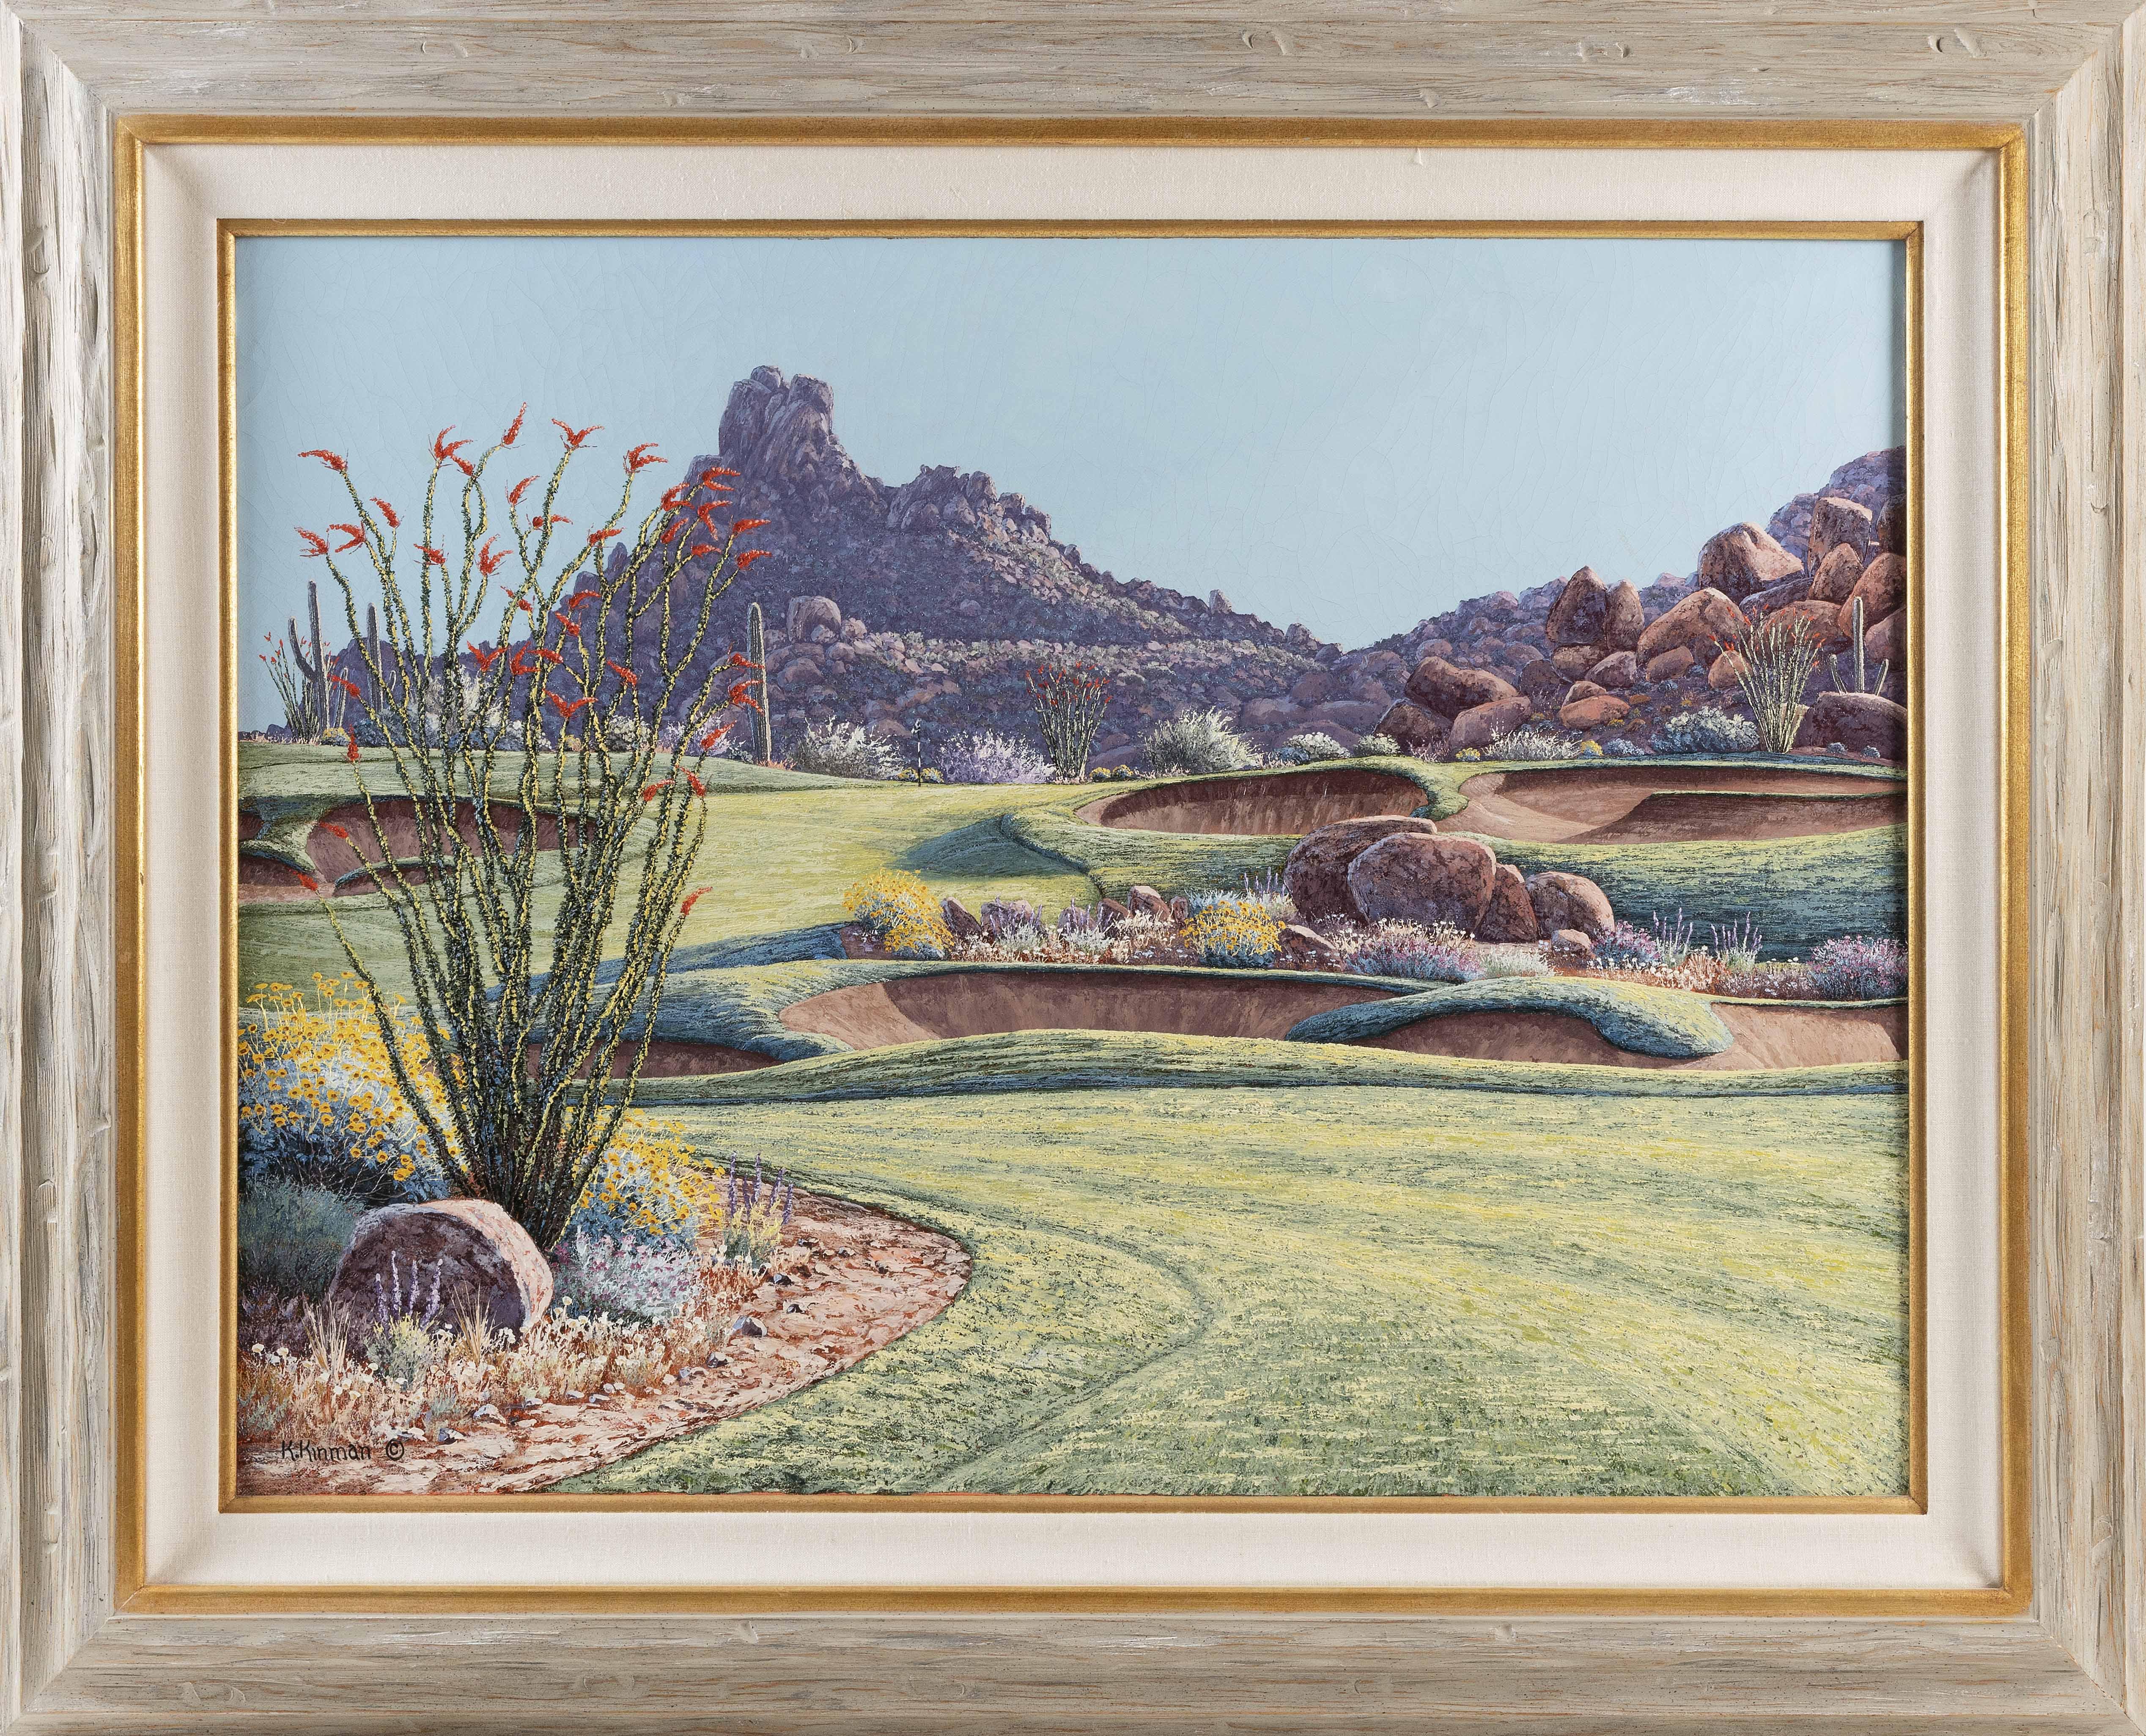 KERRY KINMAN (Oregon, 1946-2008), True North 18th Hole., Oil on canvas, 30